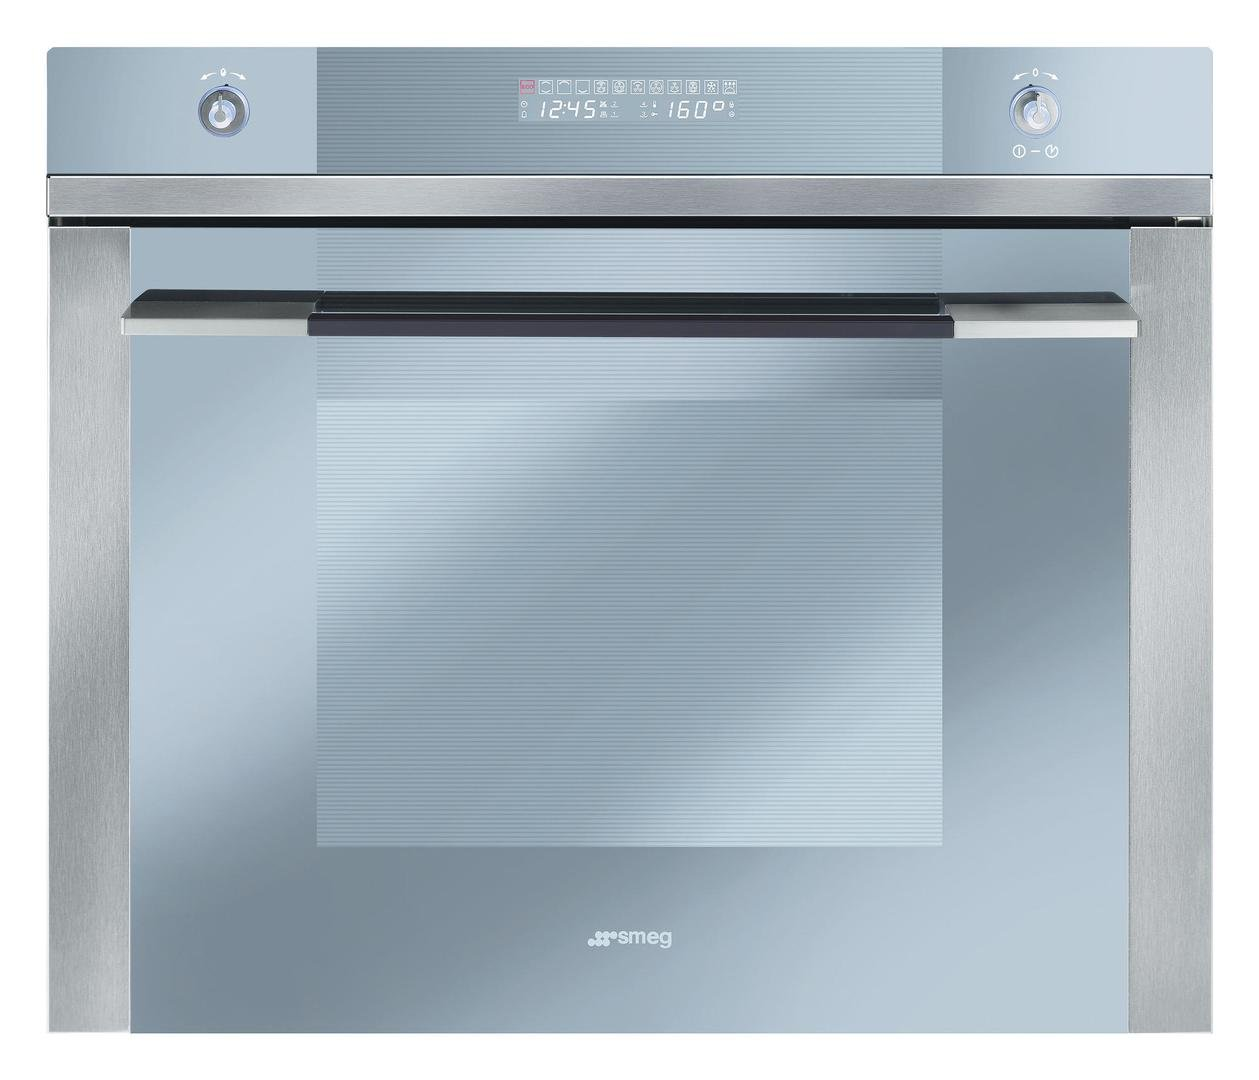 "Linea 27"" Electric Single Wall Oven"